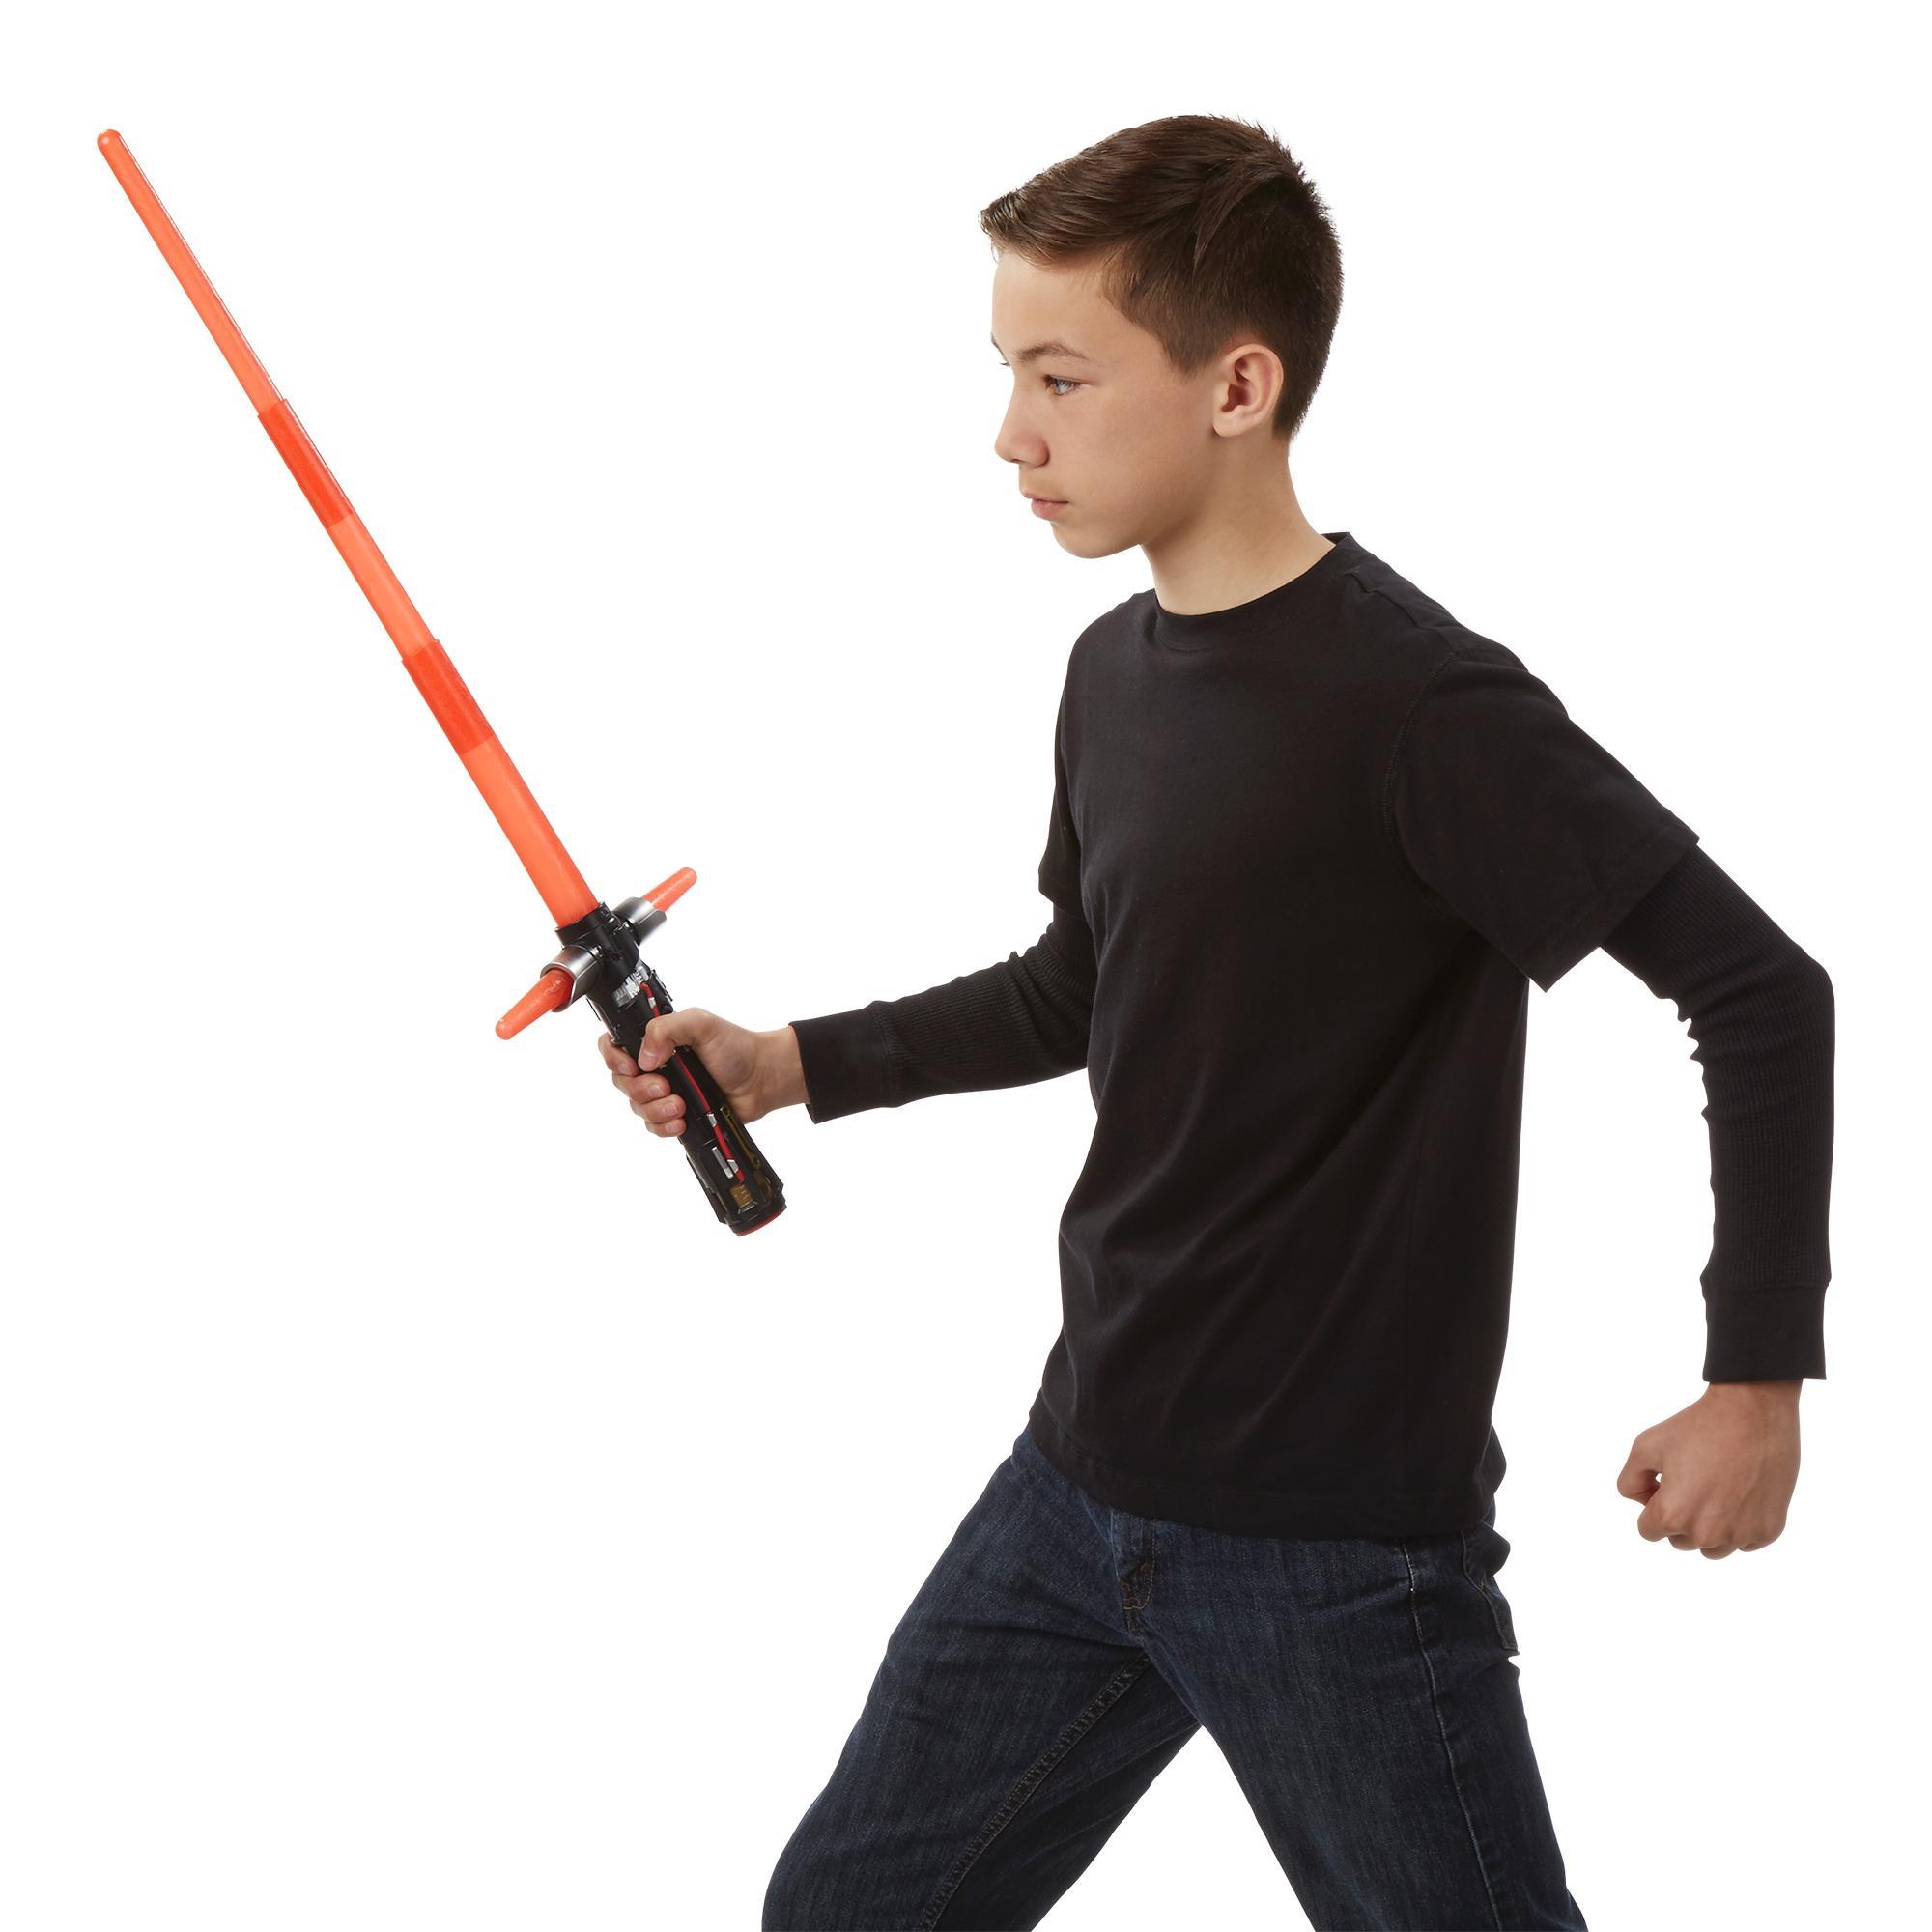 Star-Wars-The-Force-Awakens-Kylo-Ren-Deluxe-Electronic-Lightsaber thumbnail 6